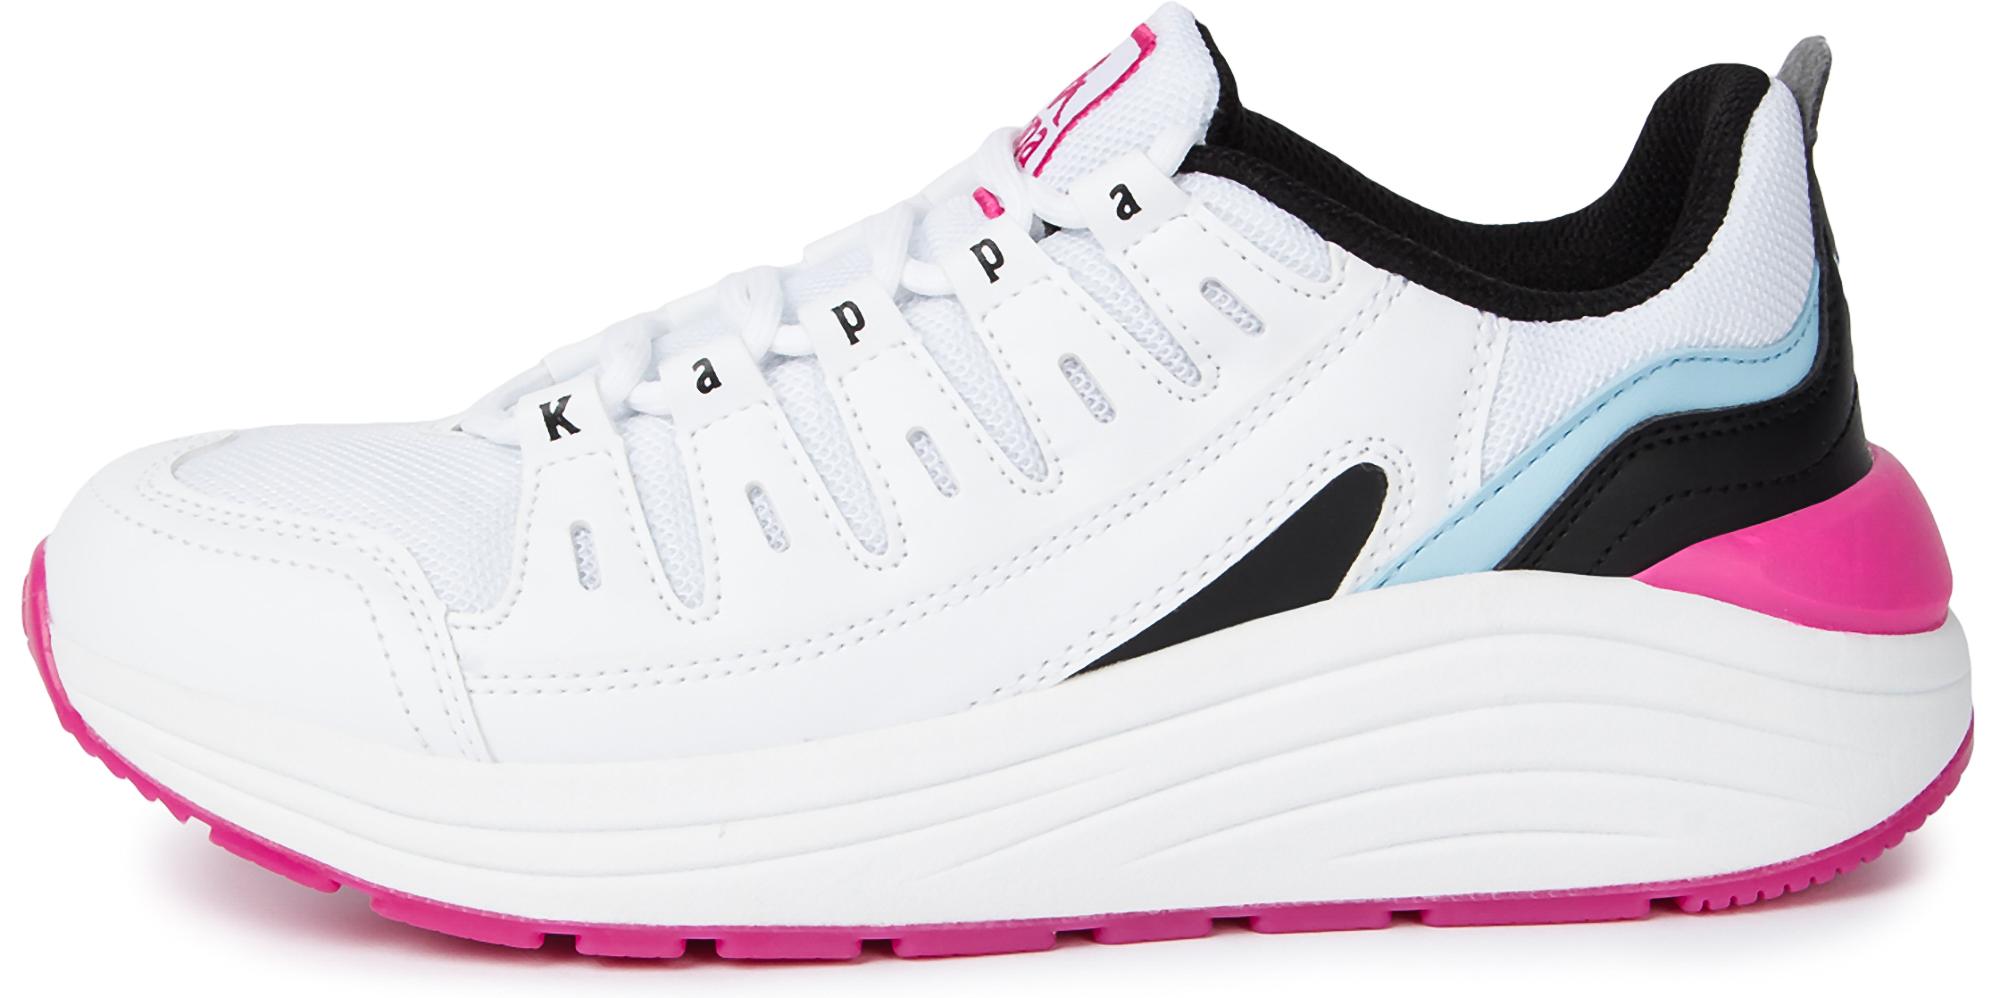 Кроссовки женские Kappa Neoclassic Nw, размер 40